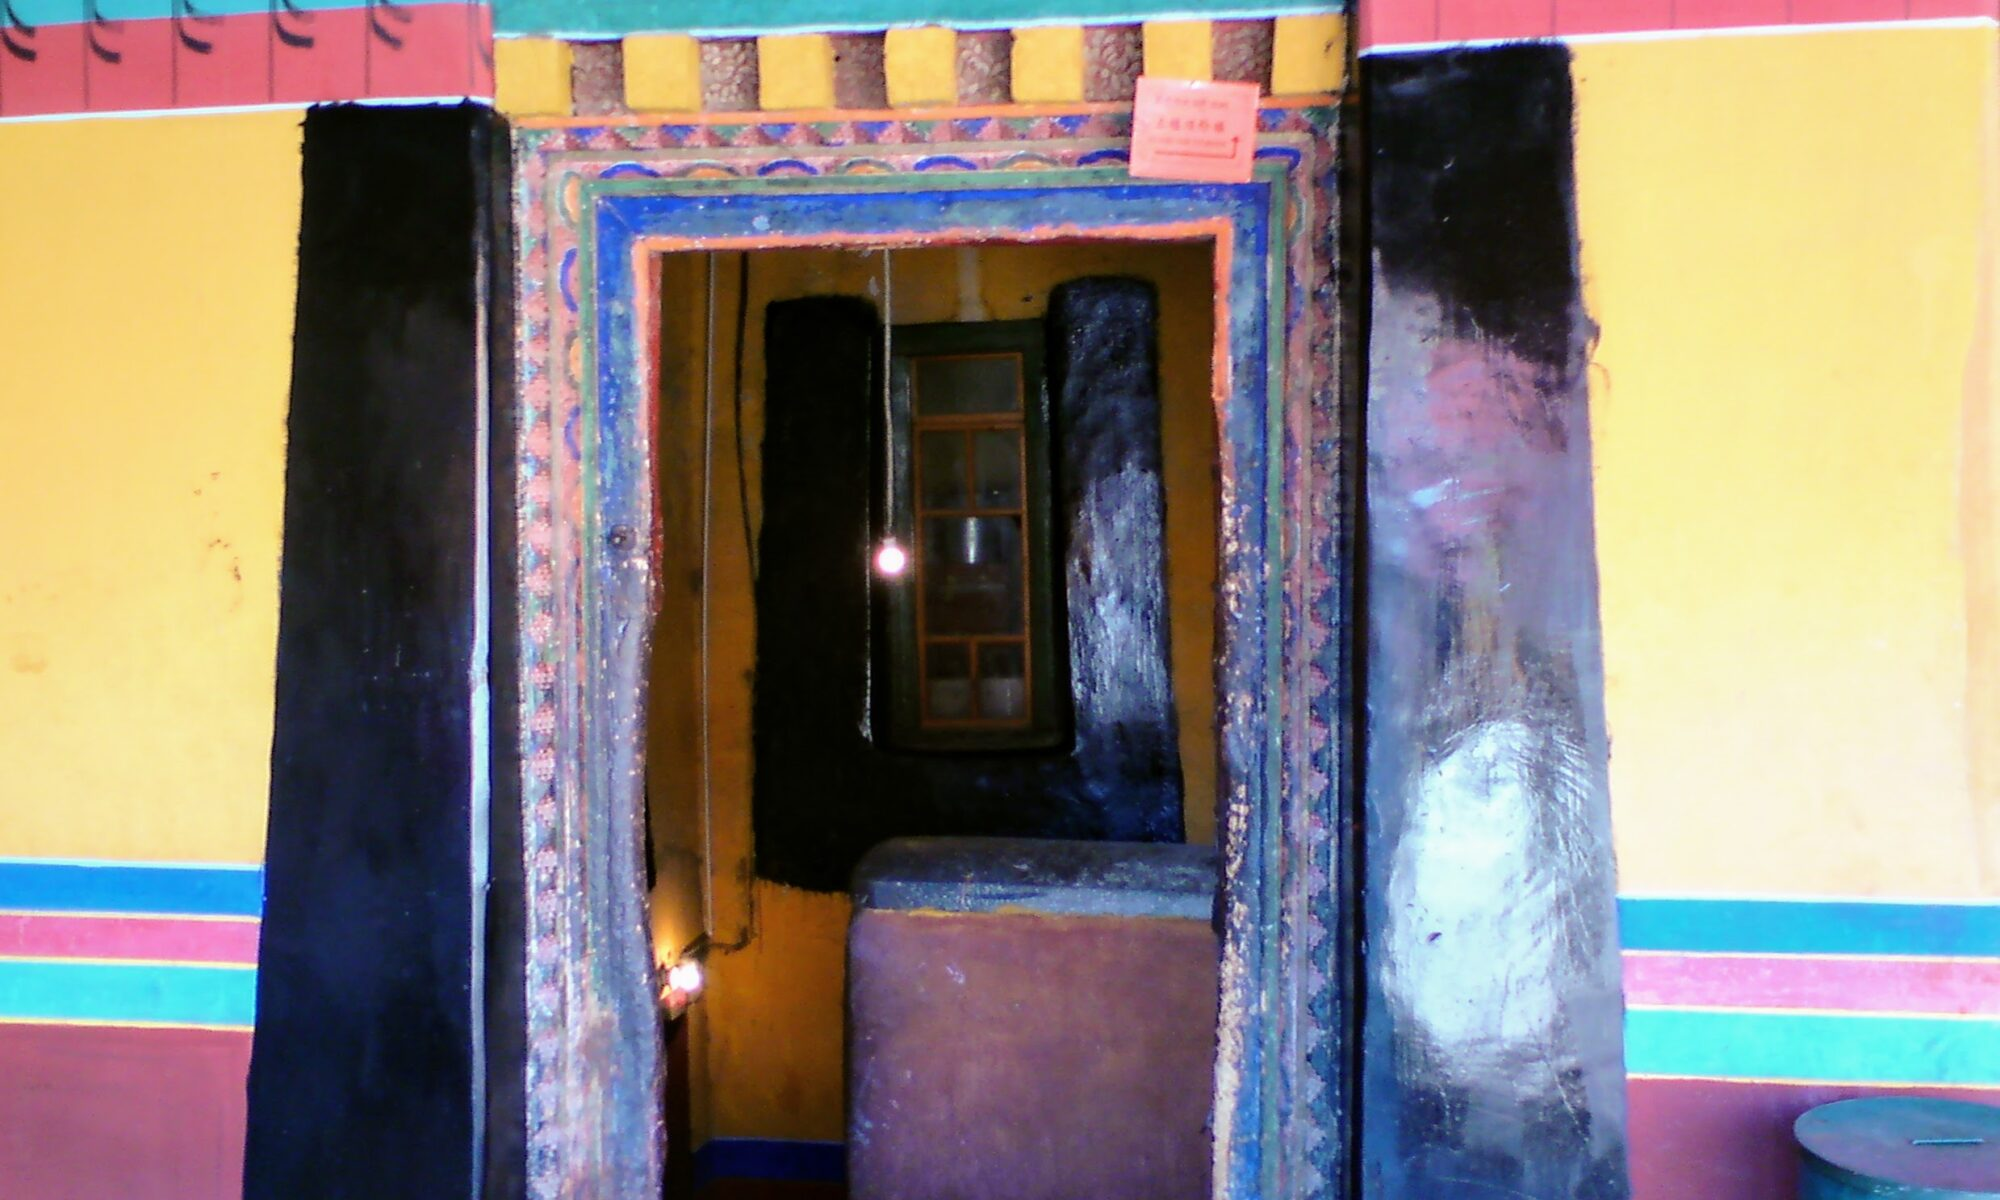 Open doorway revealing bare lightbulb hanging from the ceiling (Jokhang Temple, Lhasa, Tibet)